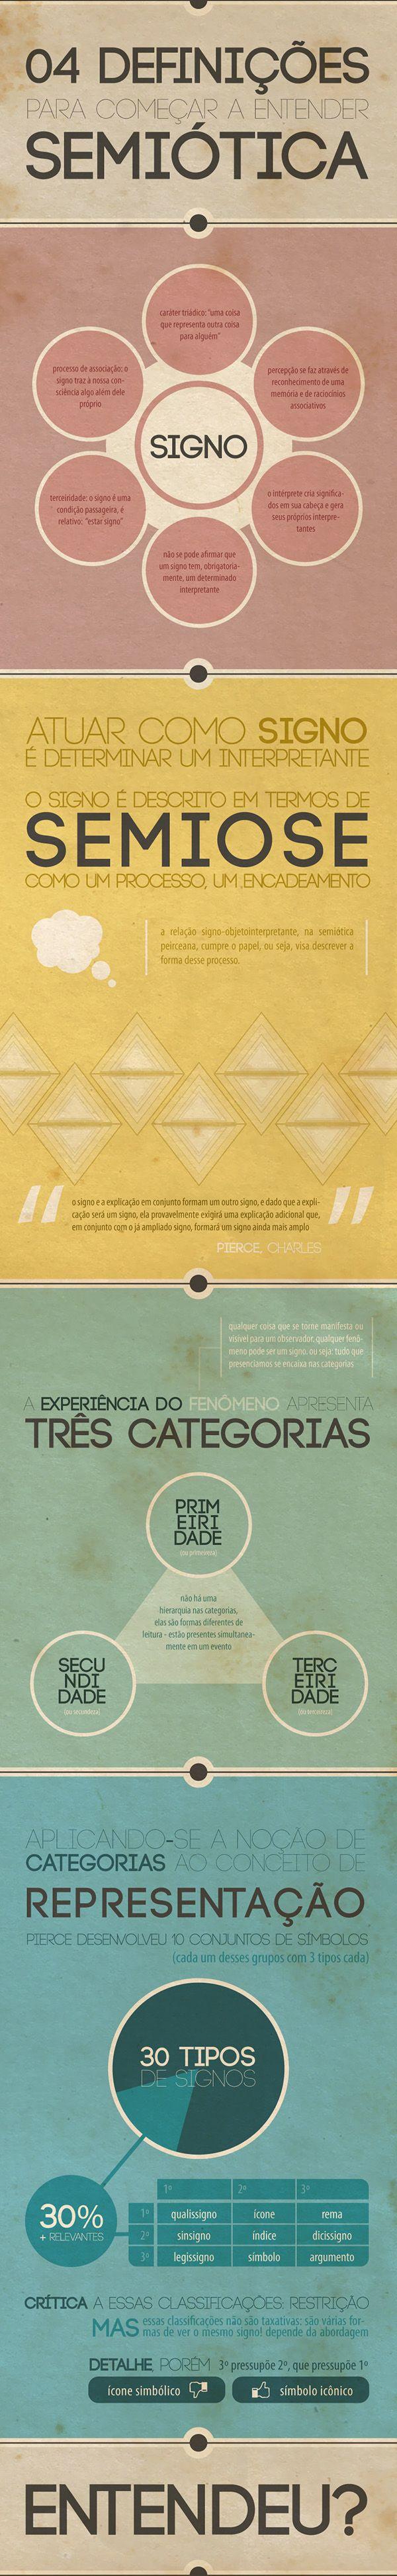 março/2012: infográfico apresentado na disciplina semiótica III